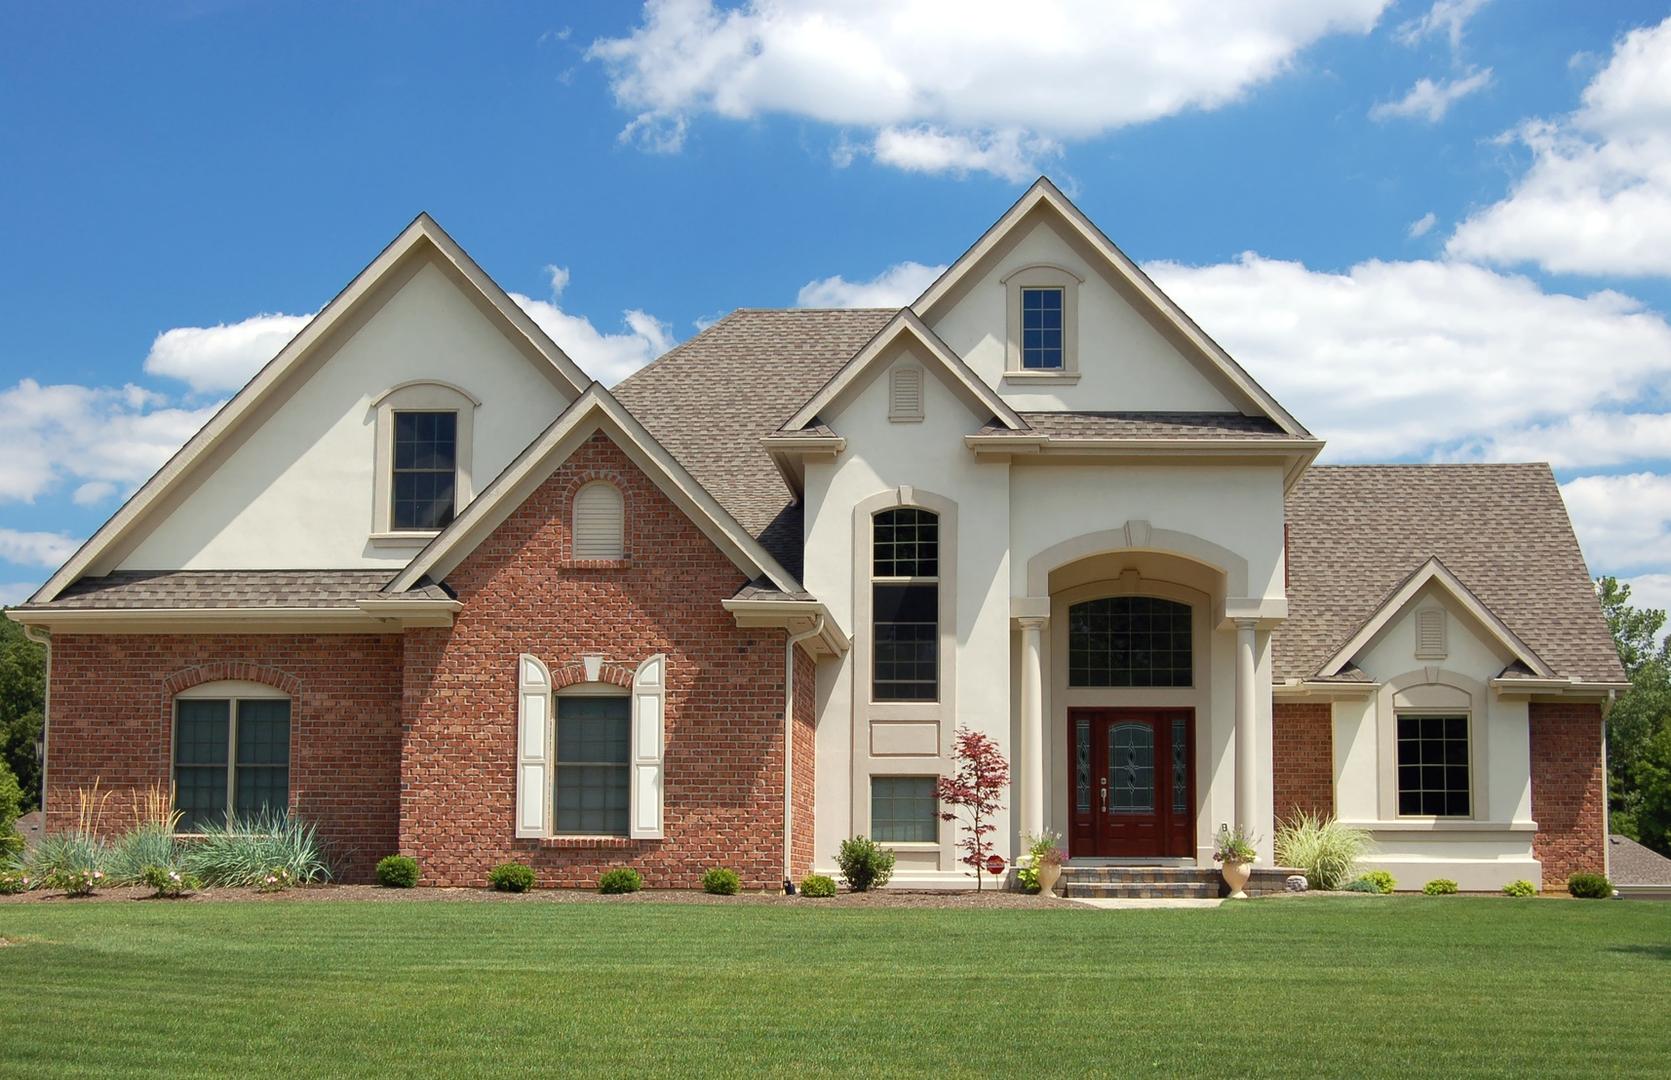 Real Estate Education in Birmingham - Real Estate